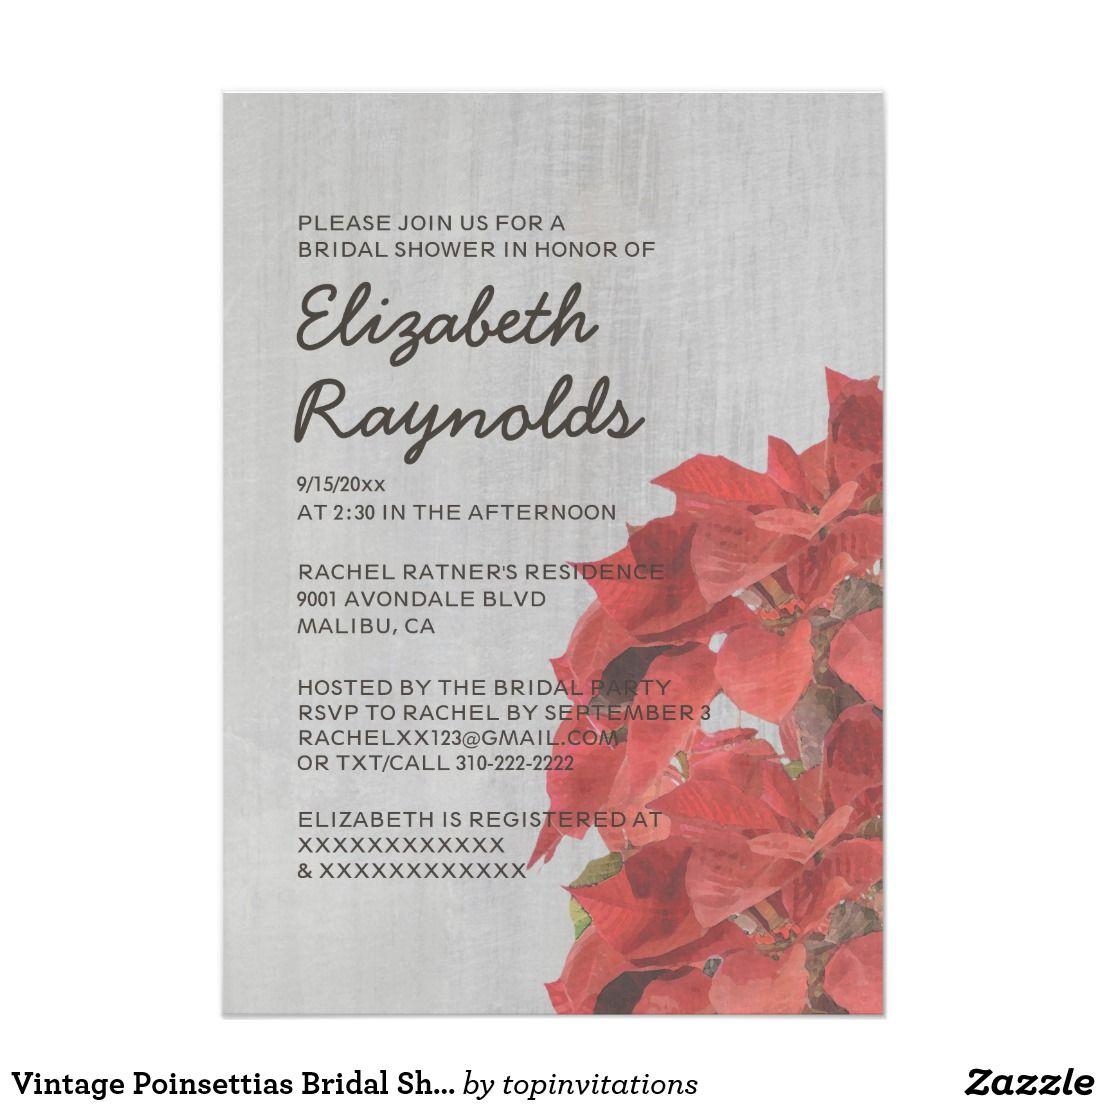 Vintage Poinsettias Bridal Shower Invitations | Bridal showers and ...